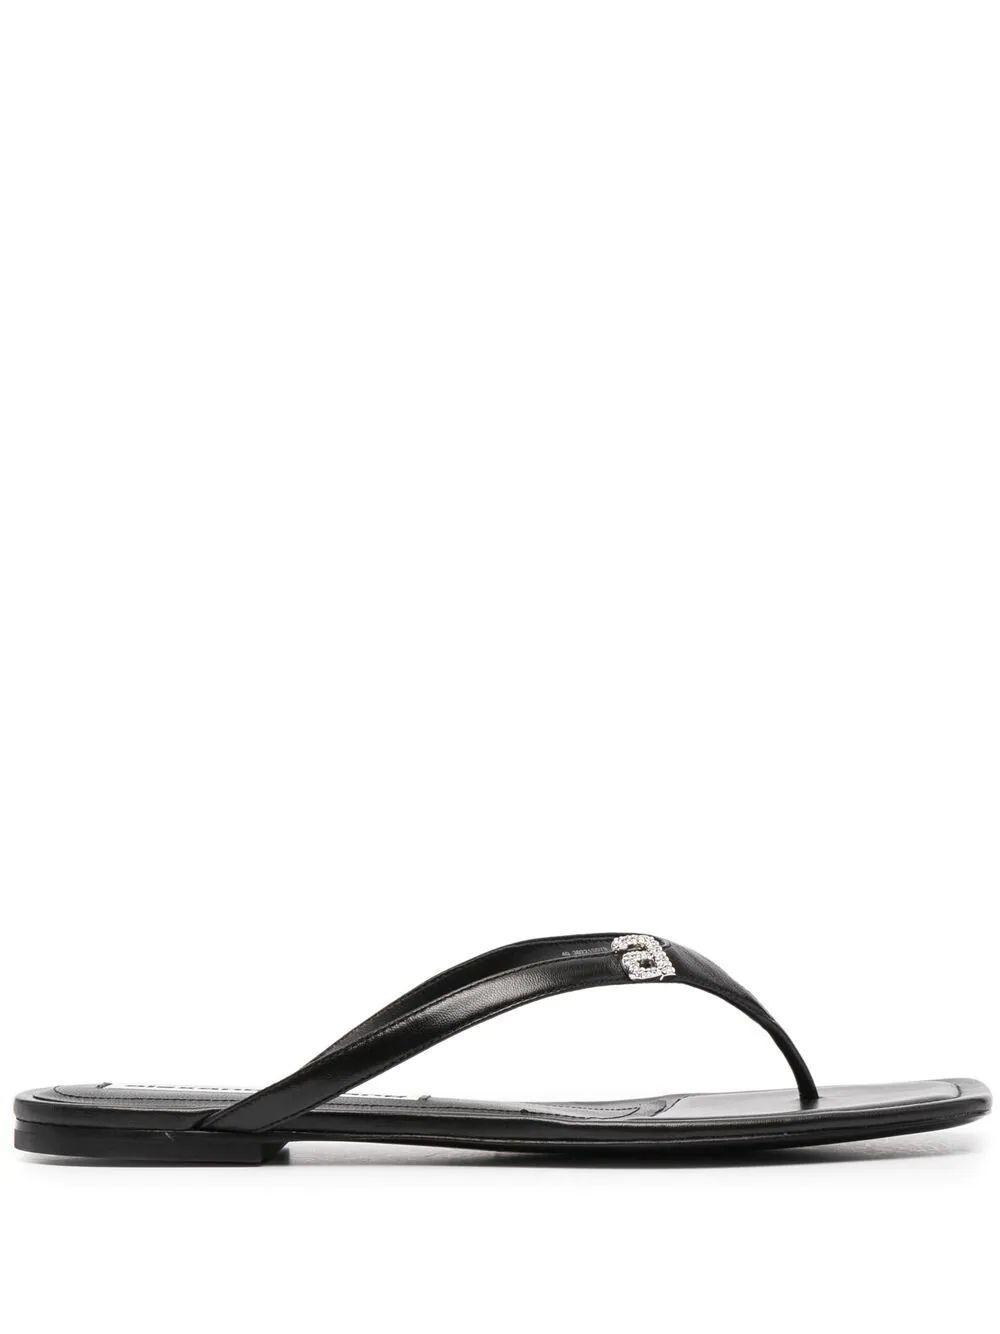 Ivy Thong Sandal Item # 30221S079